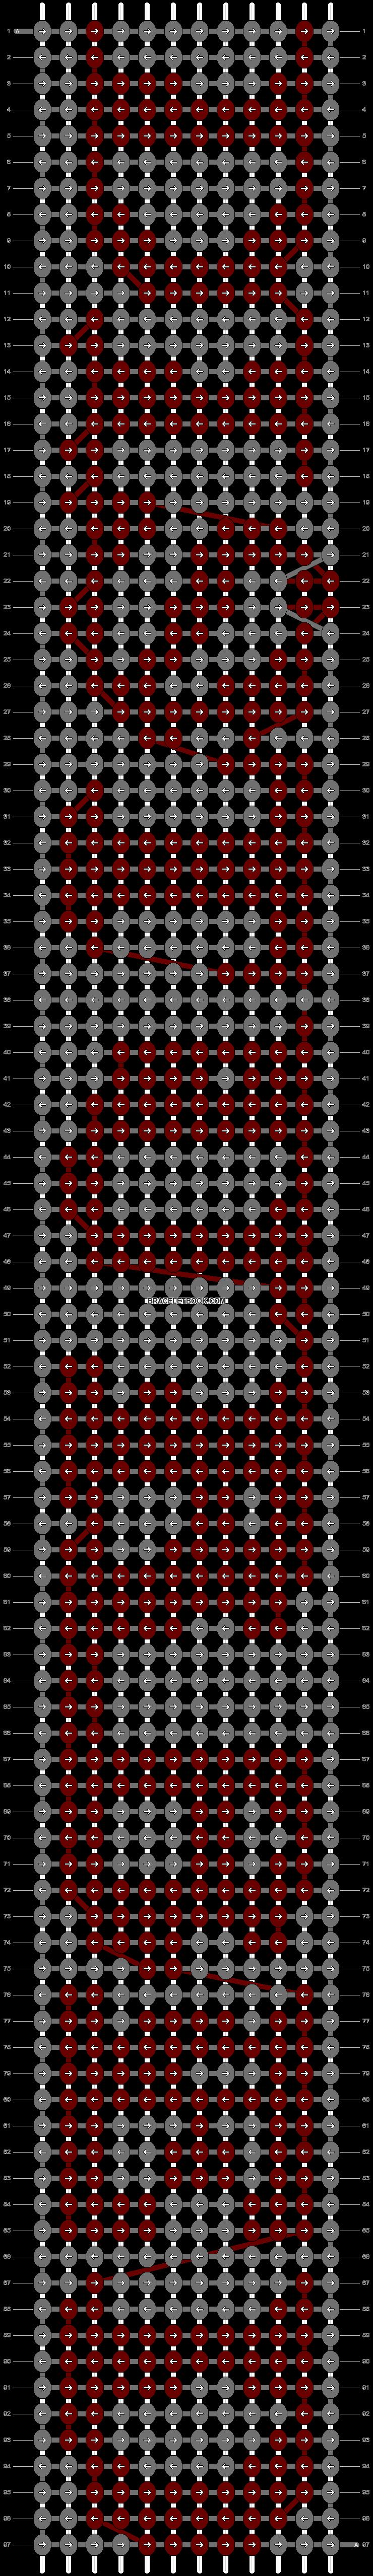 Alpha Pattern #10719 added by ajelvey01